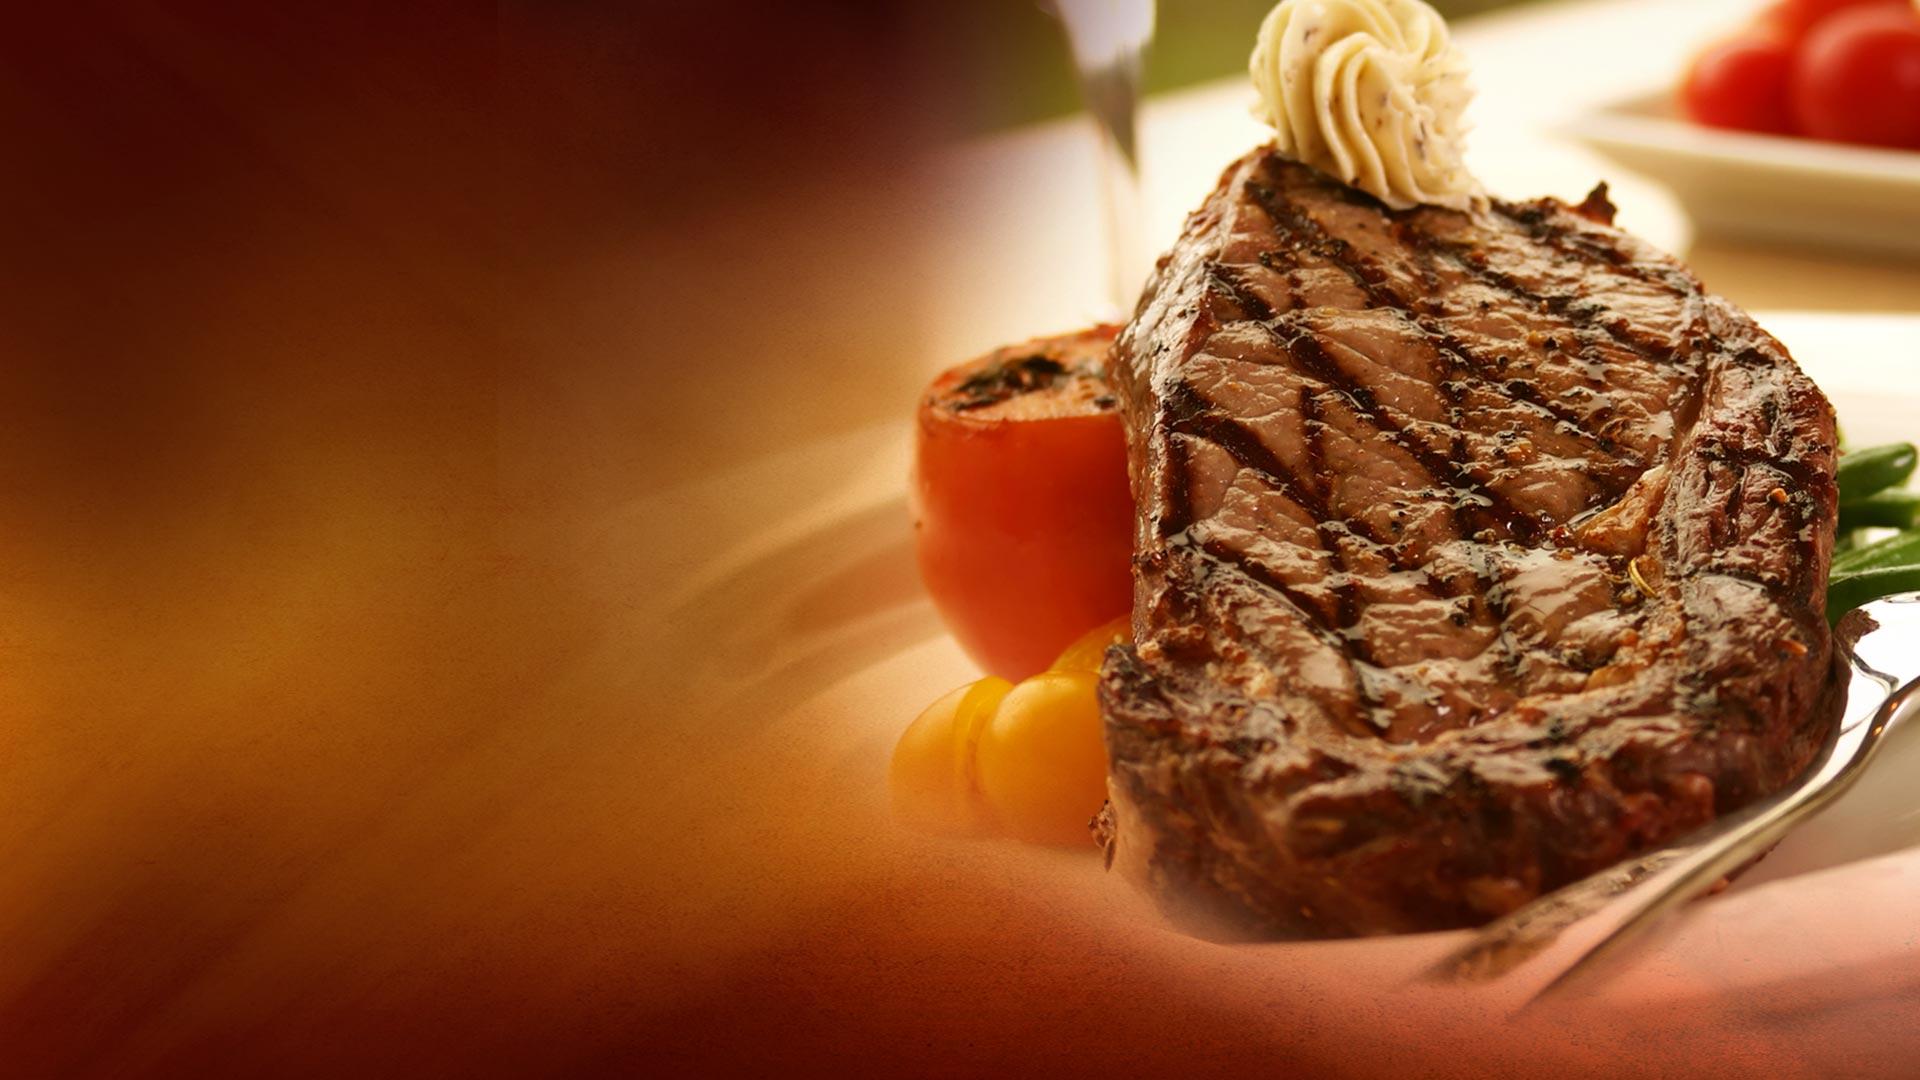 Plate of filet mignon